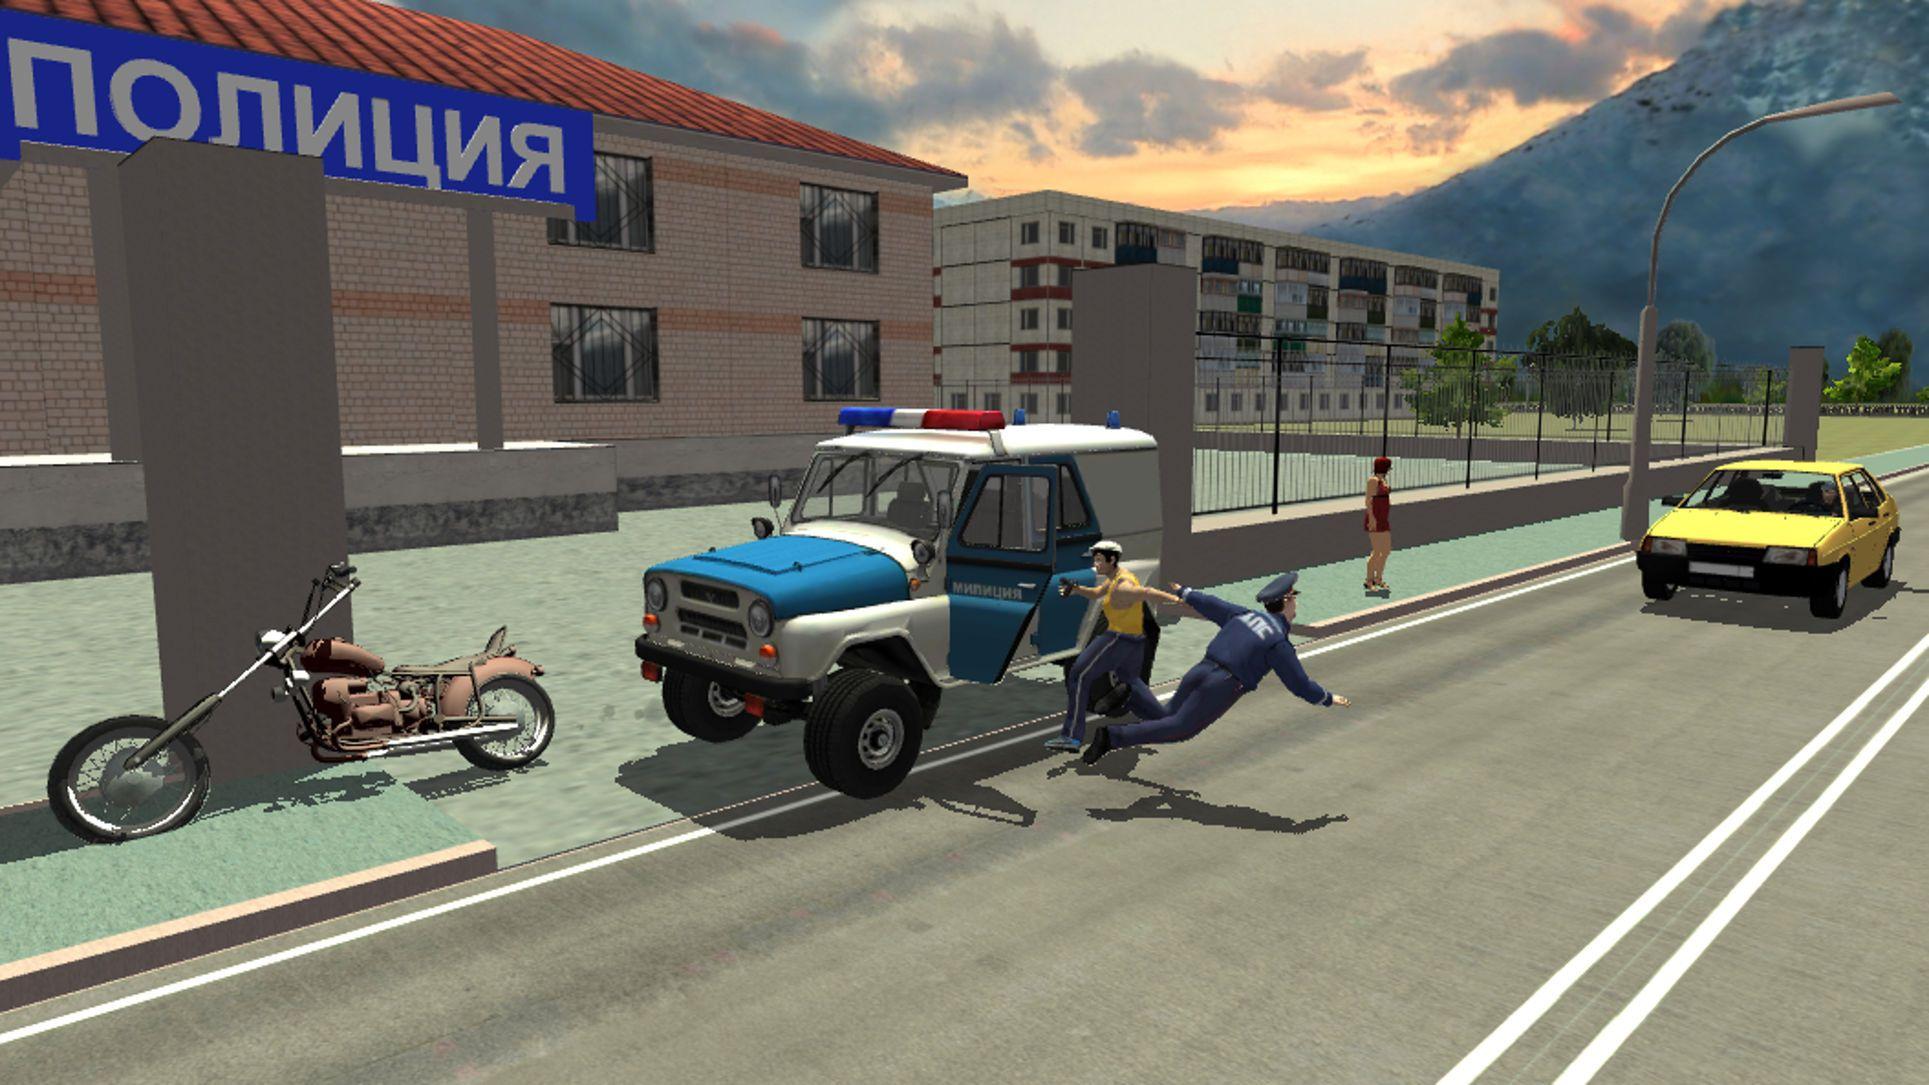 Real City Russian Car Driver Games Andreev Simulation Racing Download Games Car And Driver Free Download